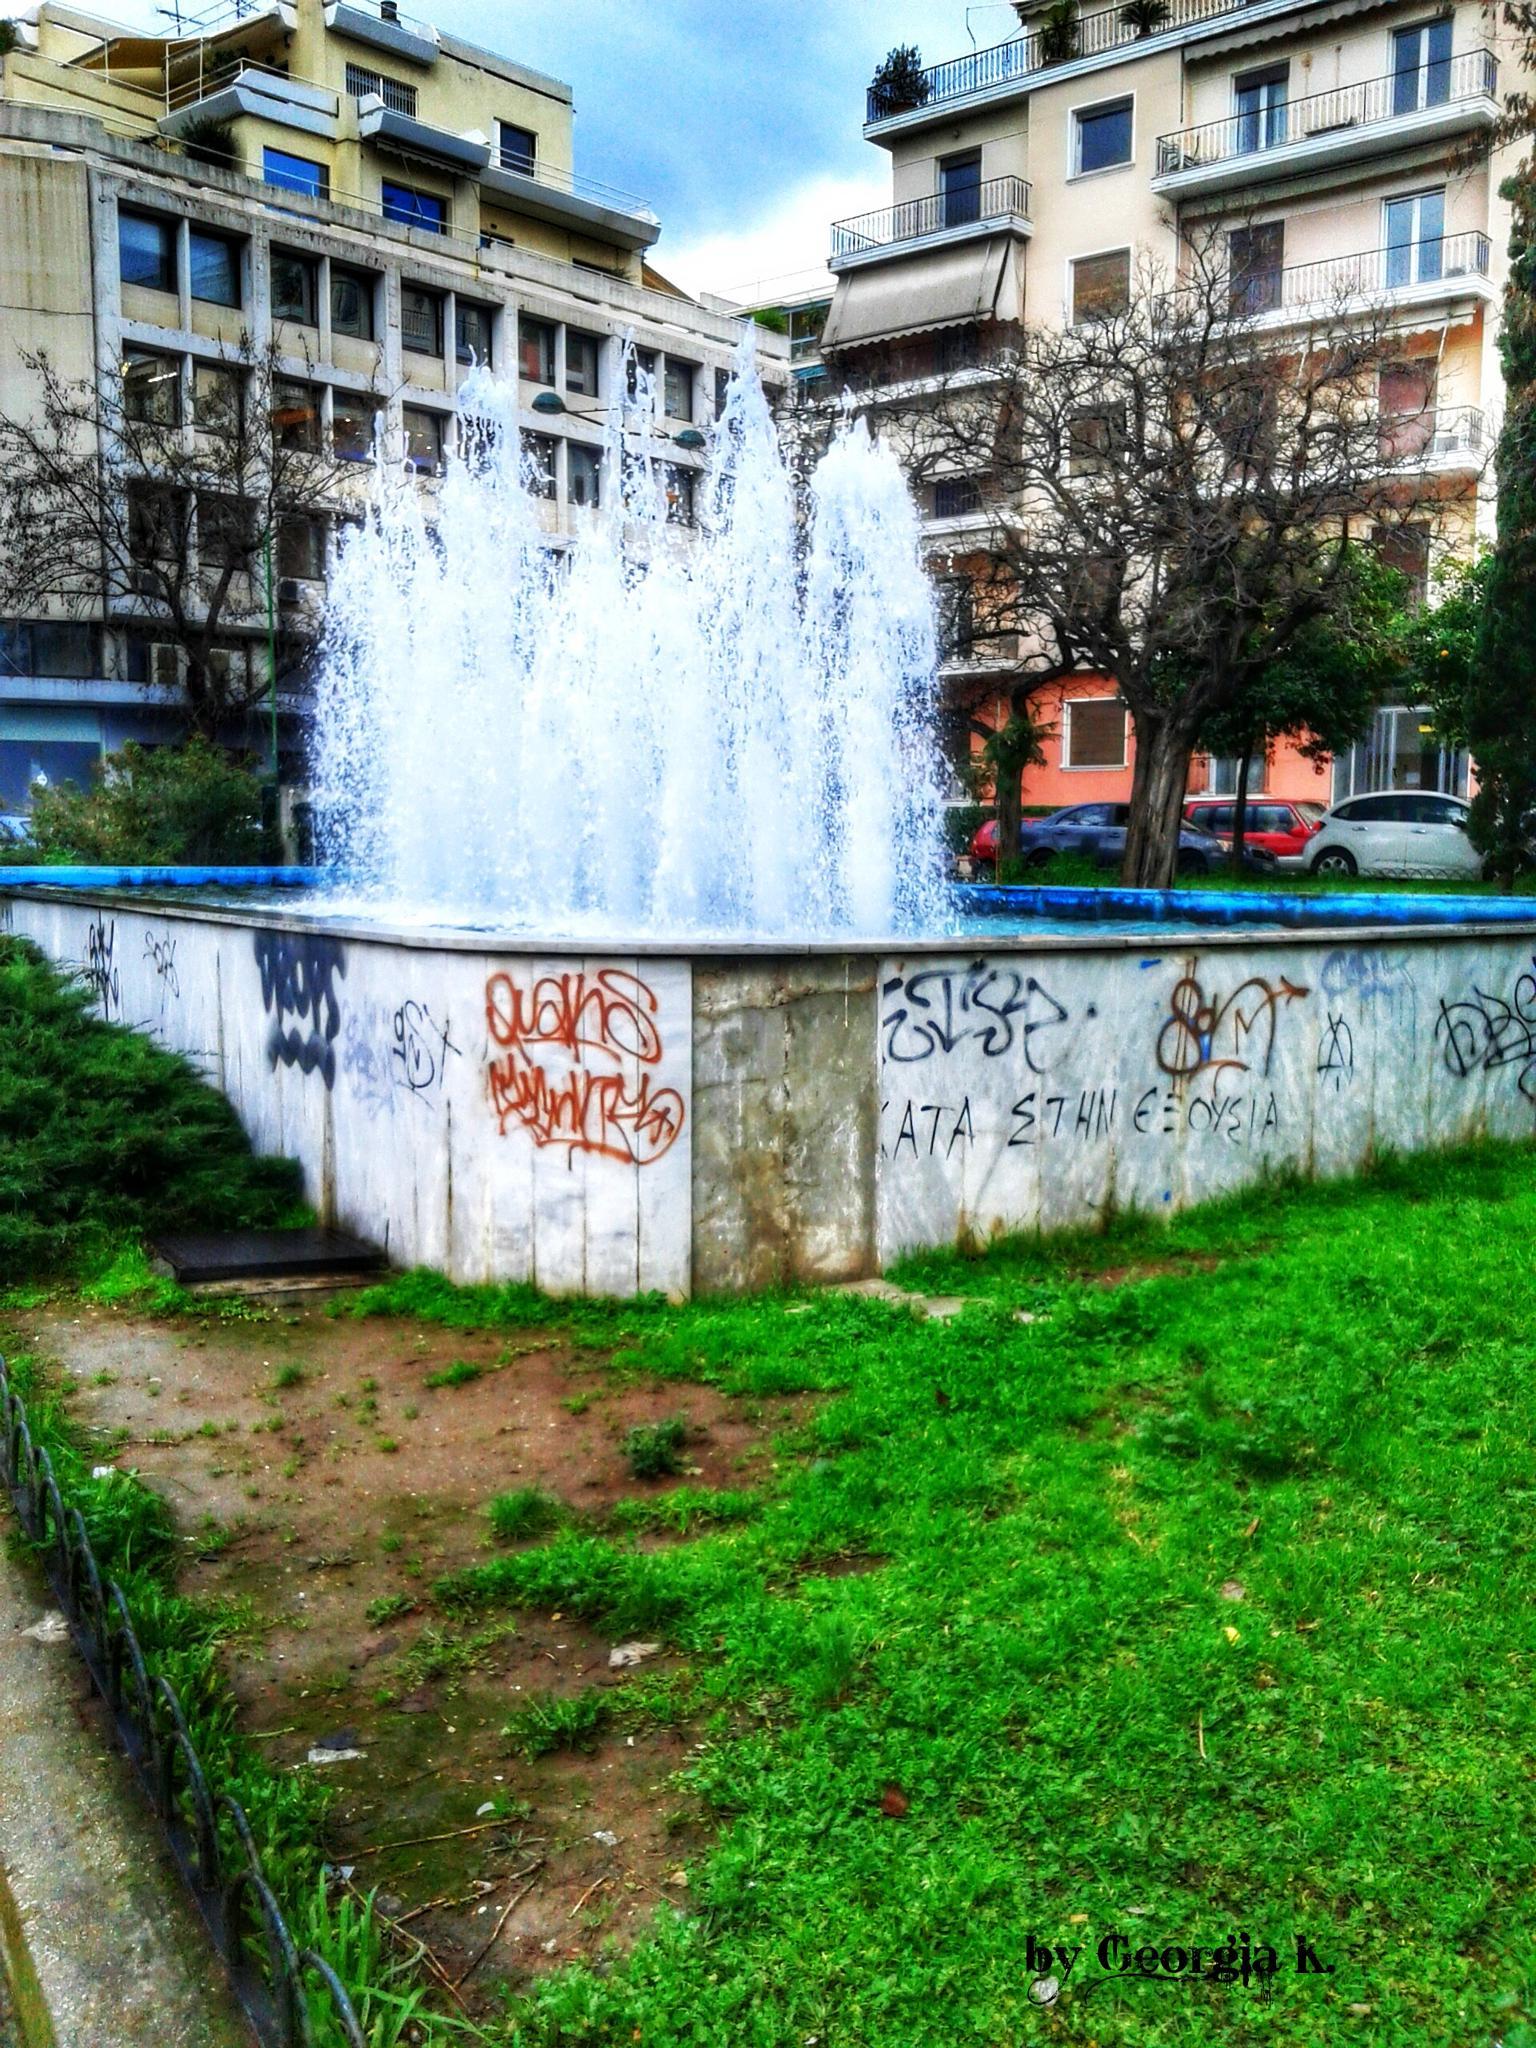 Athens by GeorgiaKom